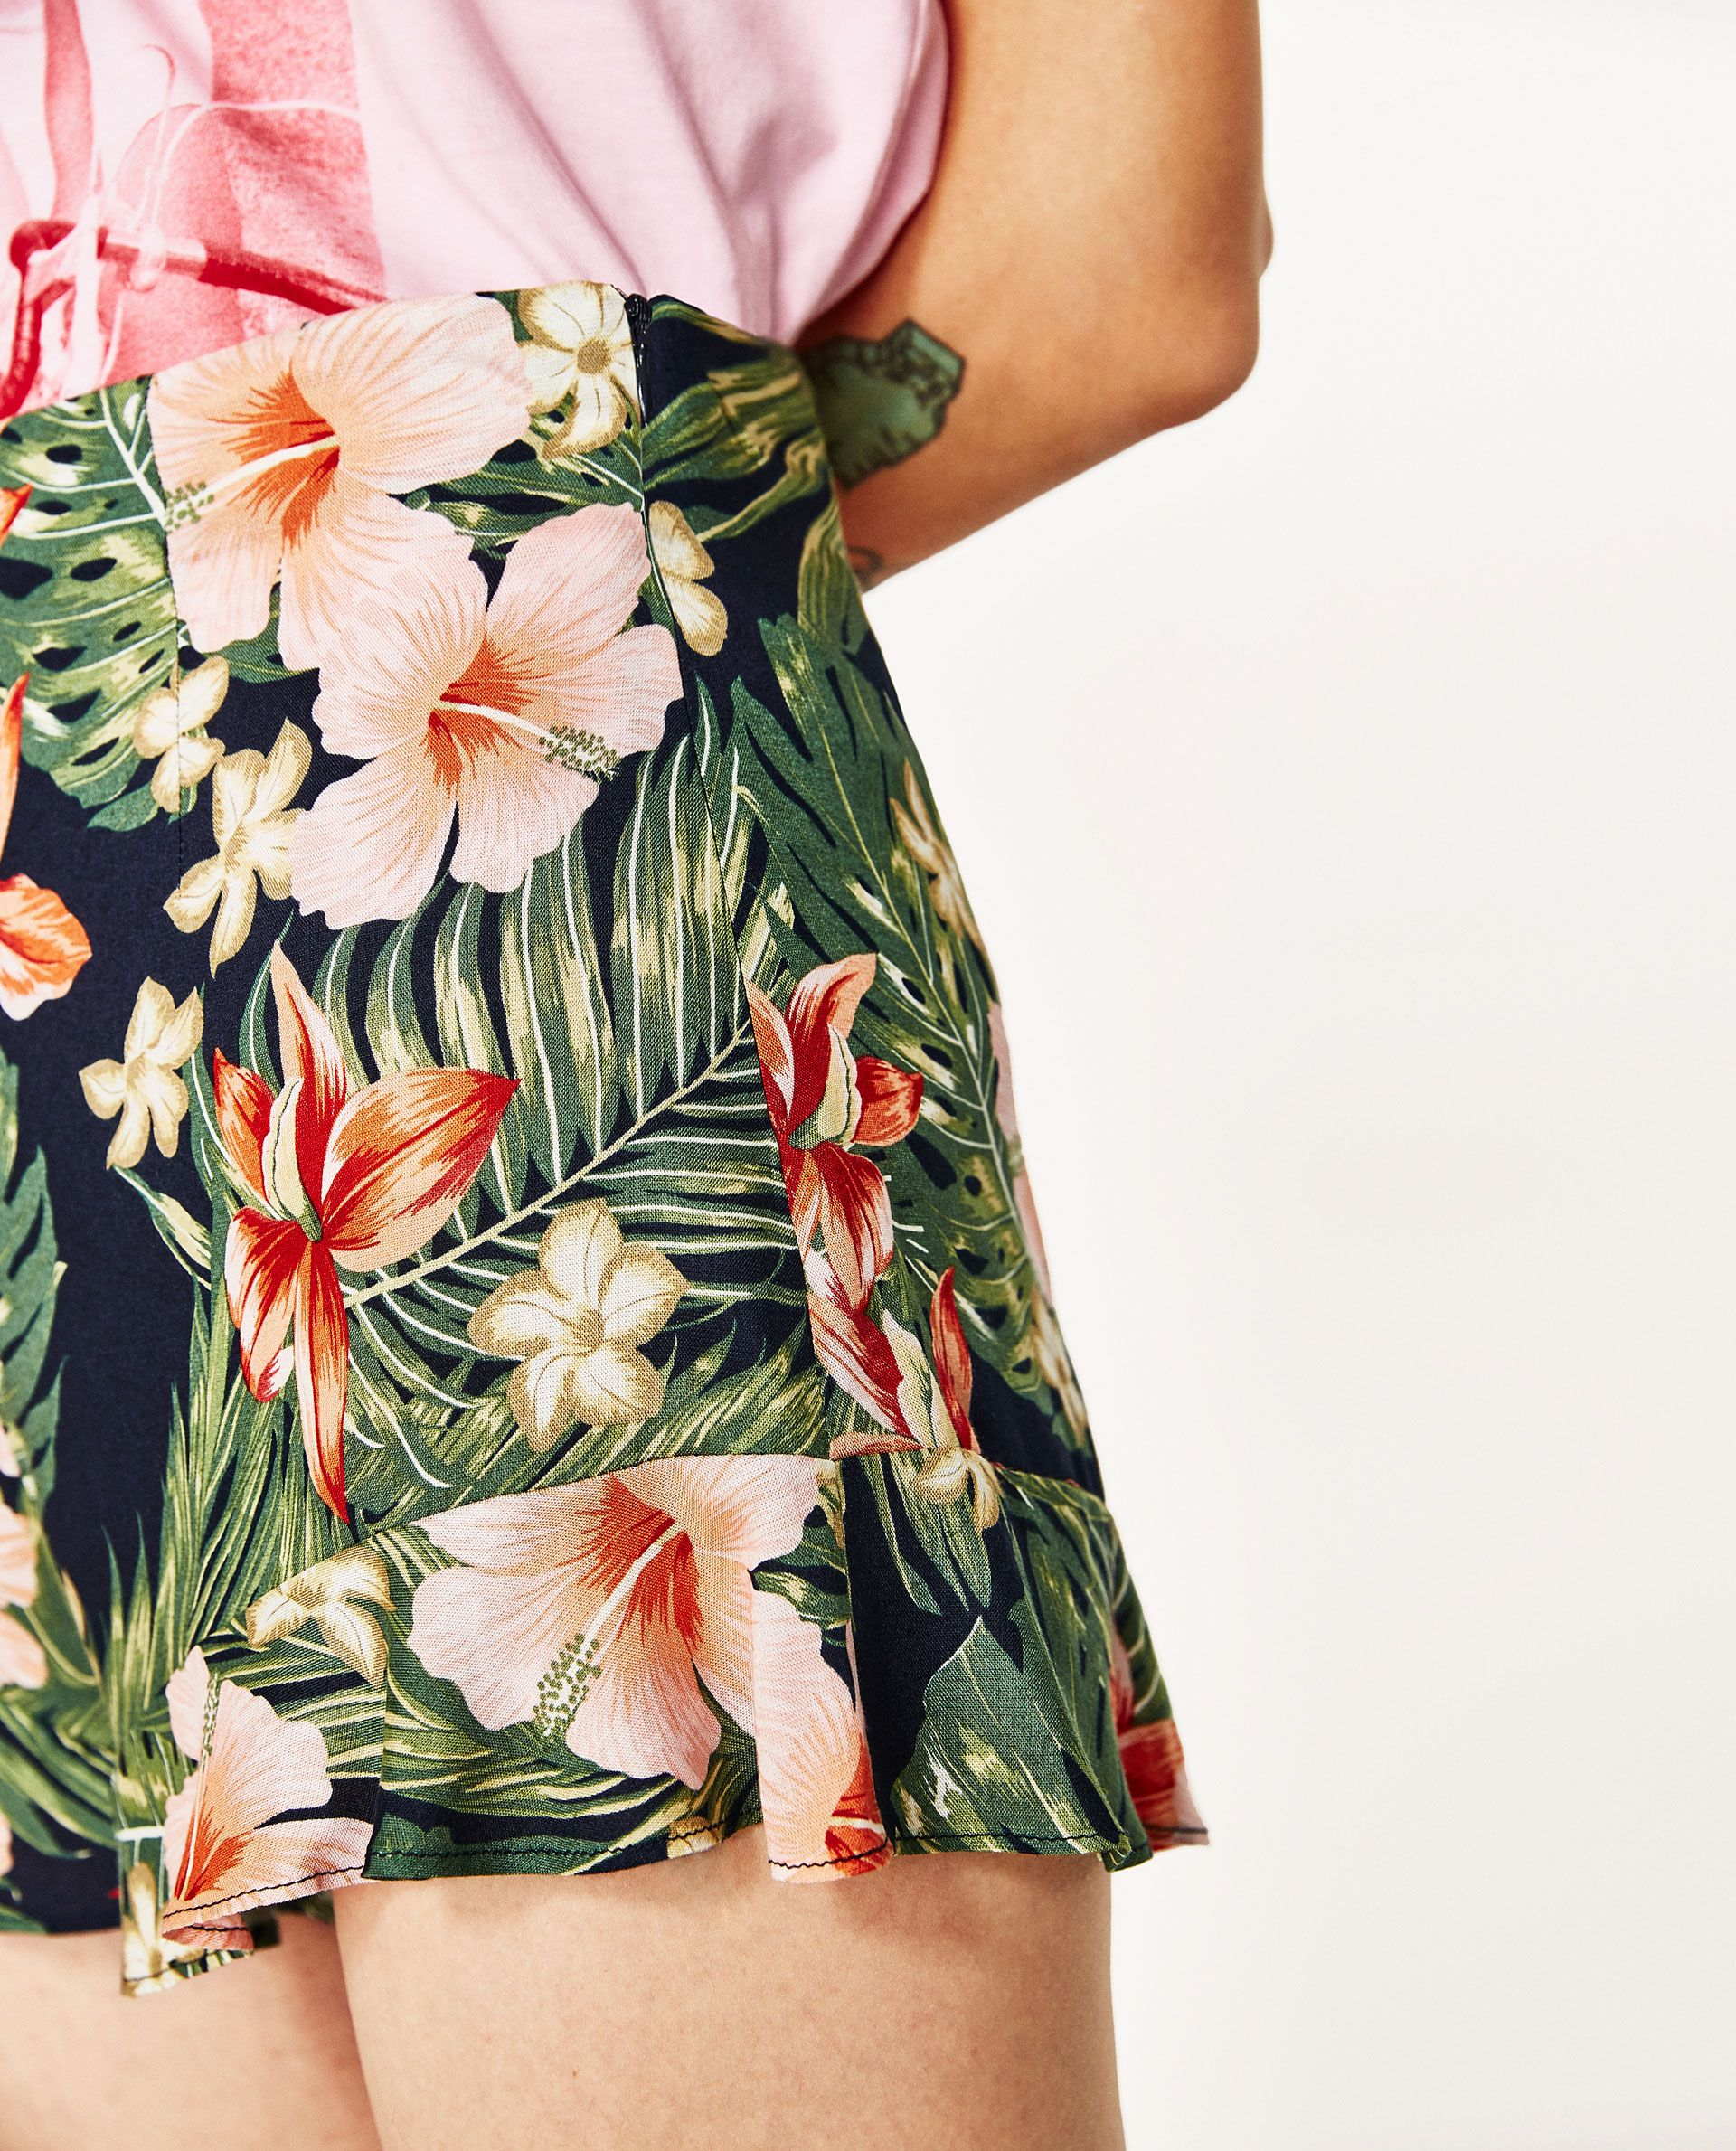 e0d5a472f7 RUFFLED FLORAL PRINT BERMUDA SHORTS   Zara 2   Floral prints ...